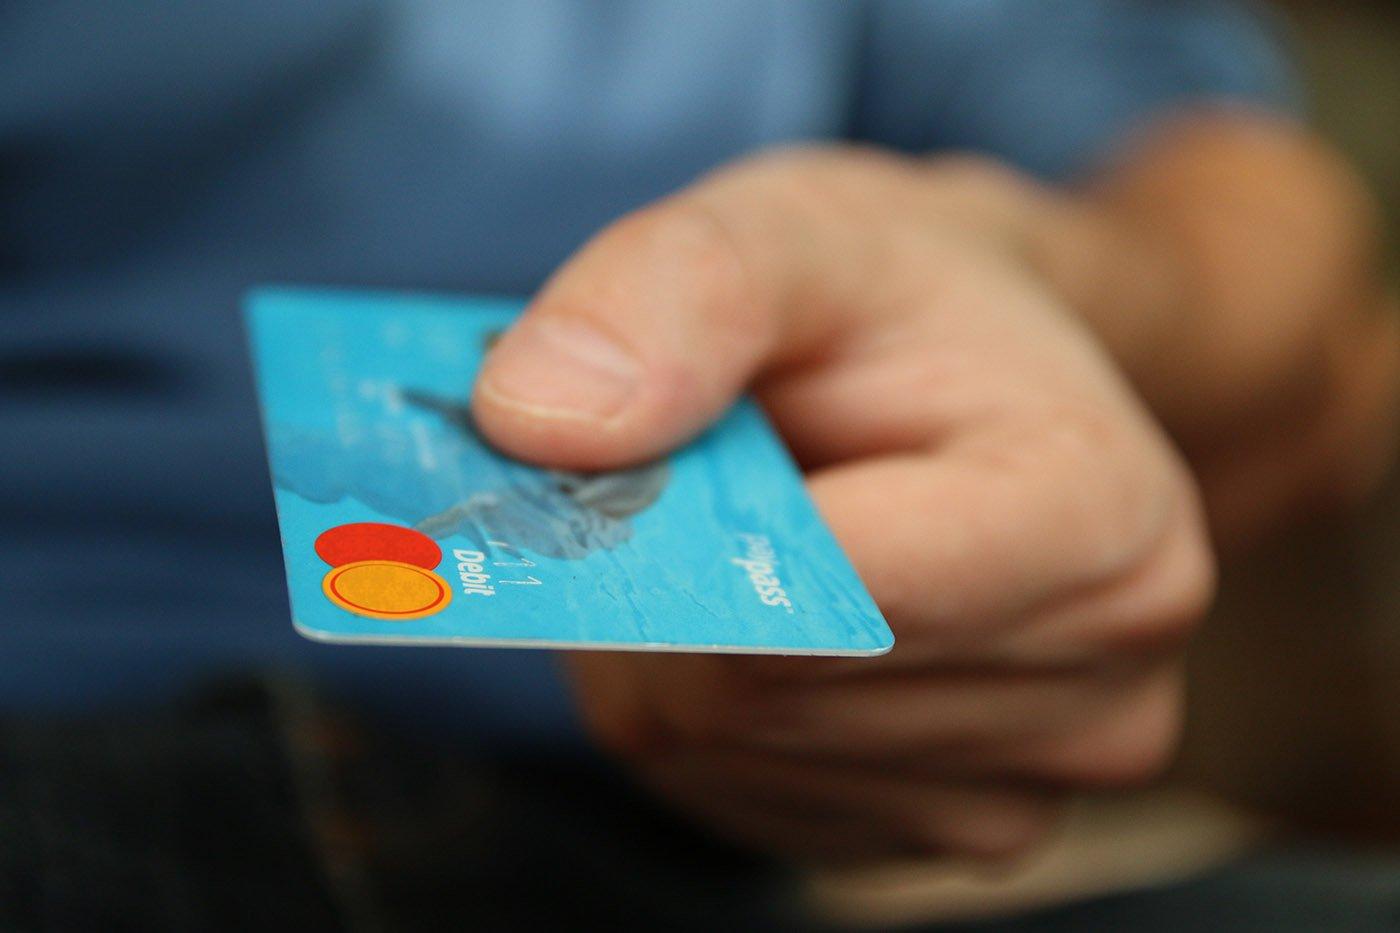 seller central financial information credit card